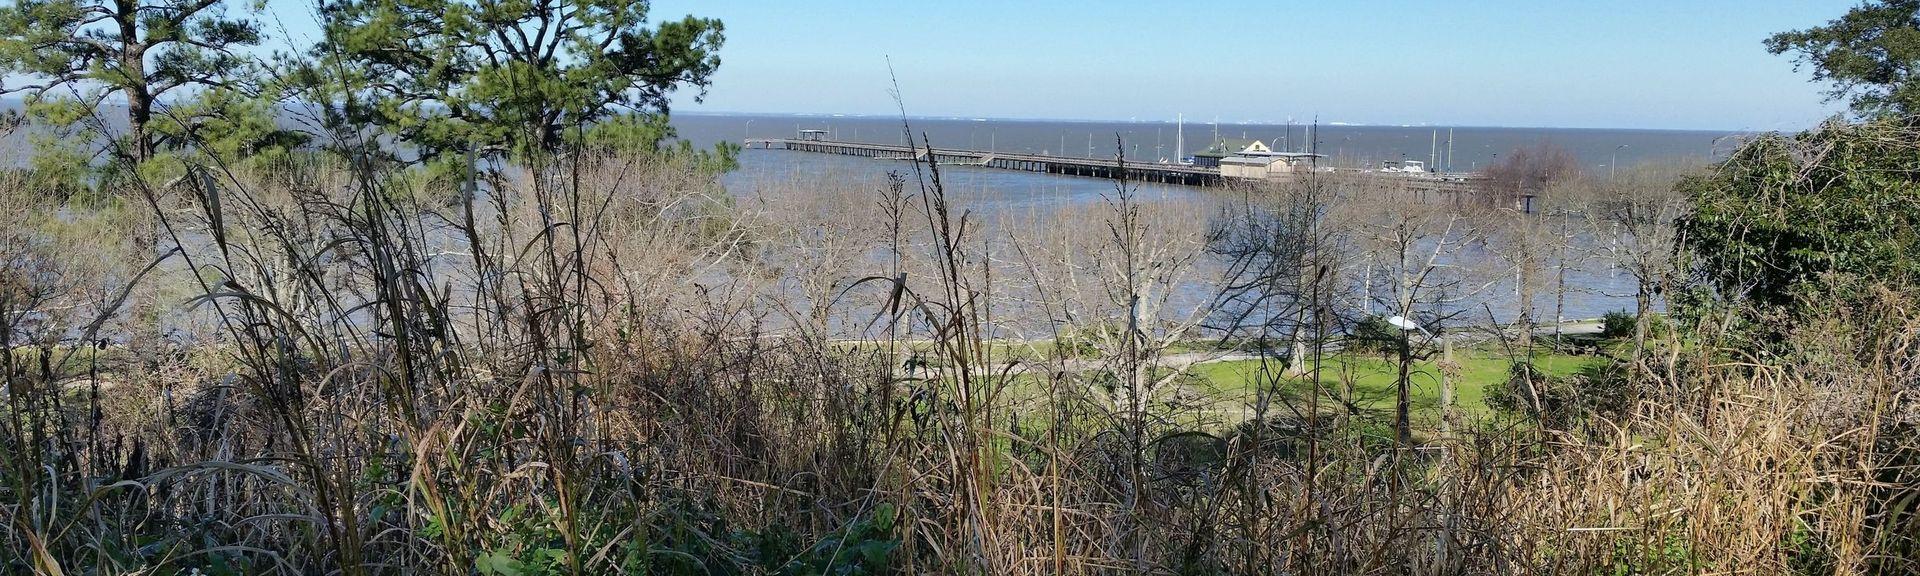 Fairhope Municipal Pier, Fairhope, AL, USA